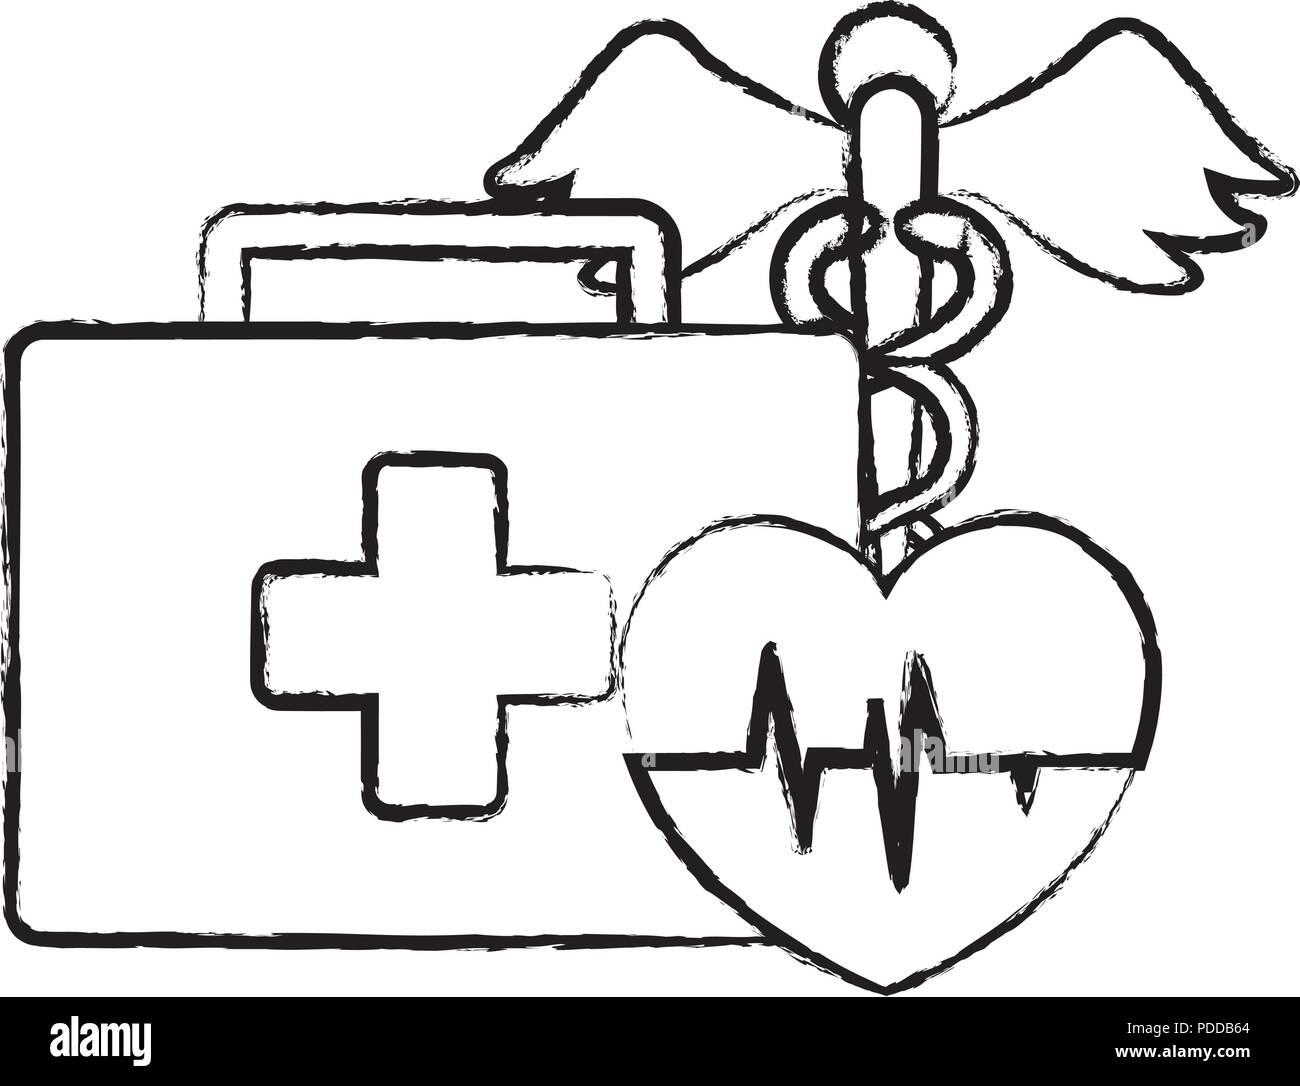 Medicine Symbol Snake Black And White Stock Photos Images Alamy